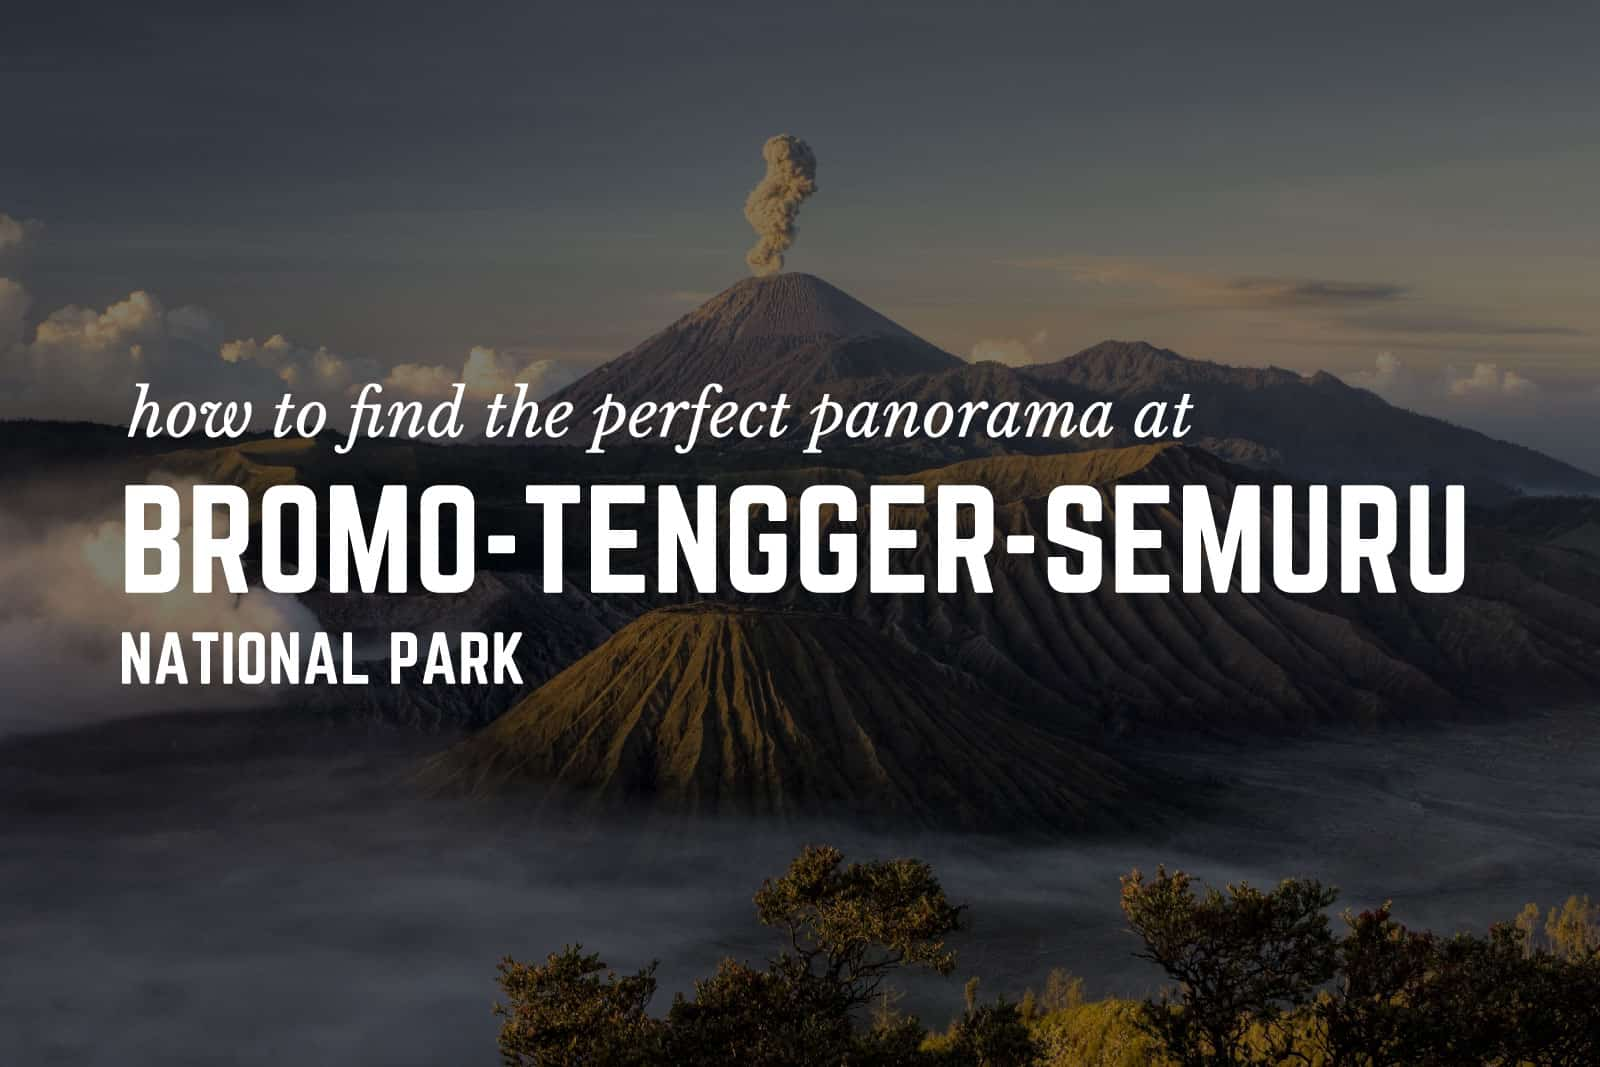 Finding the Perfect Panorama at Bromo-Tengger-Semeru National Park